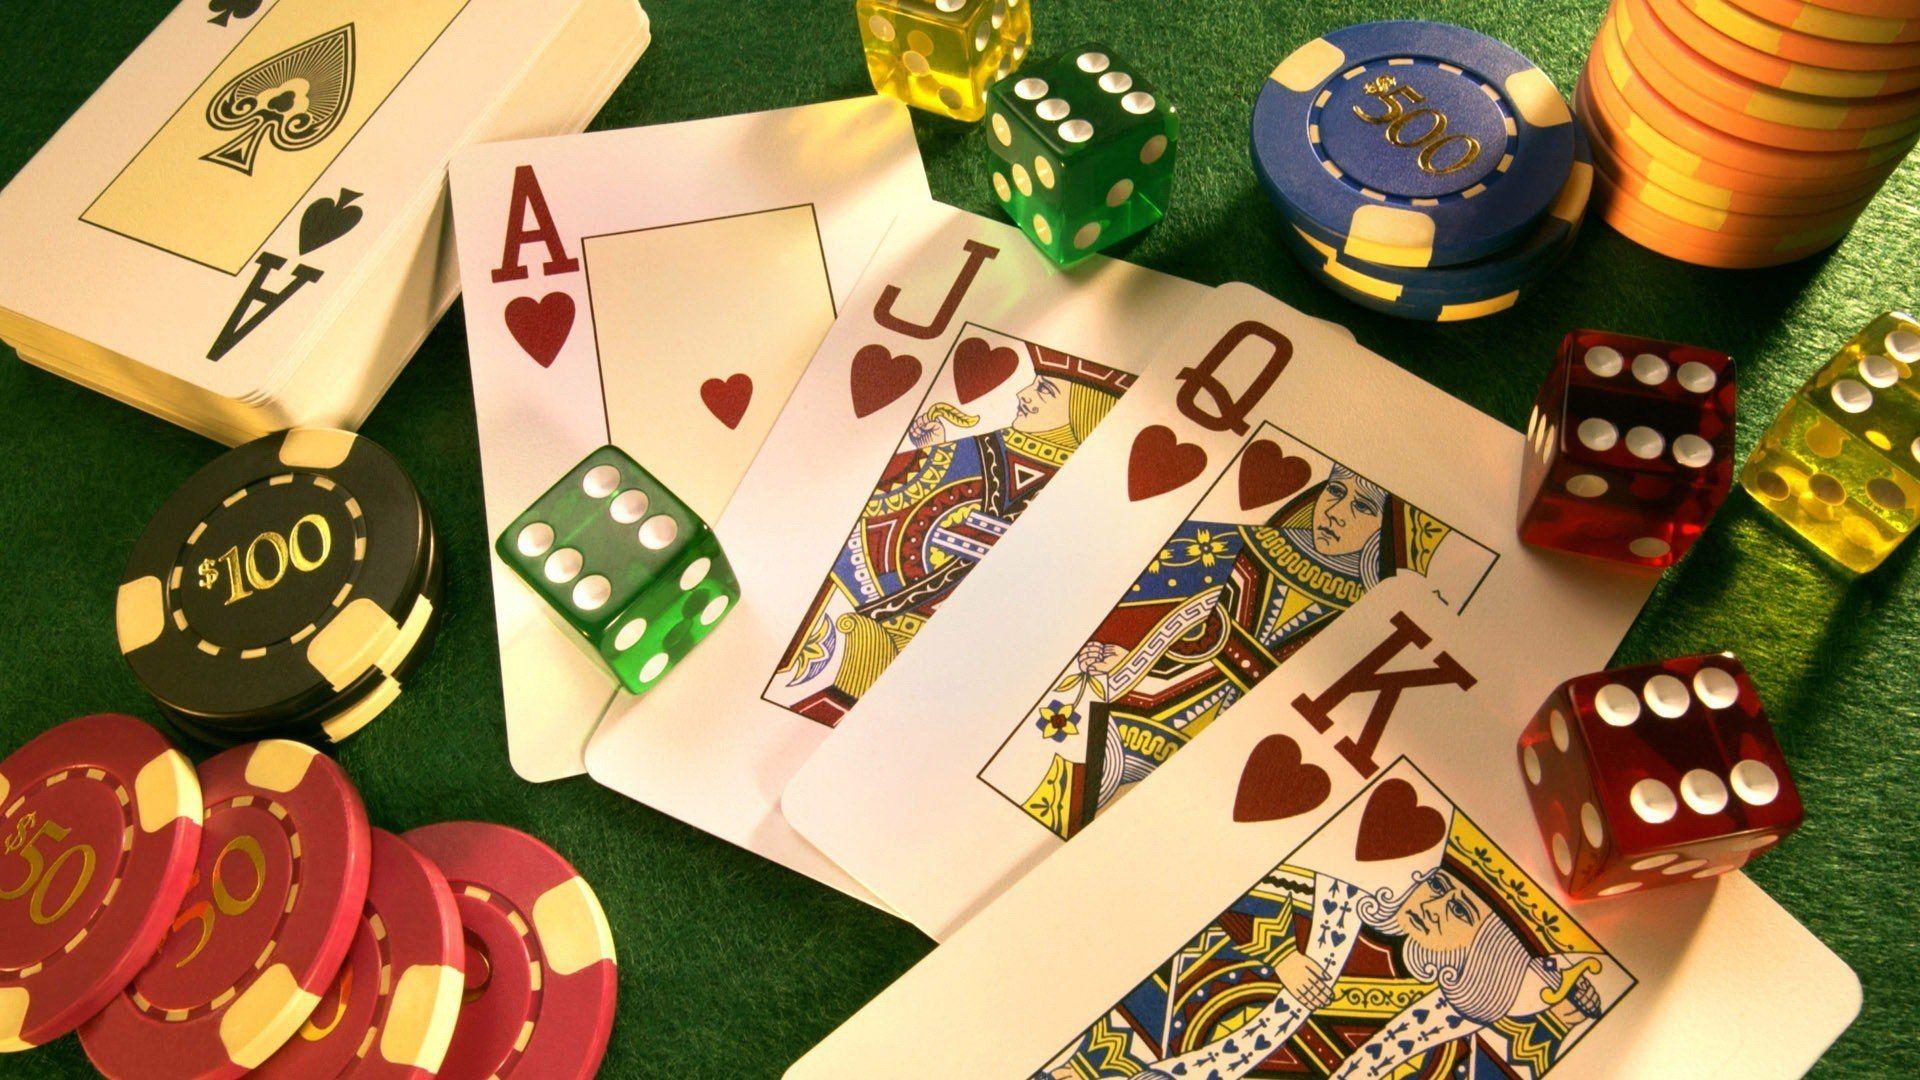 Gambling Wallpaper. [1920x1080] Bola, M777, Cassino